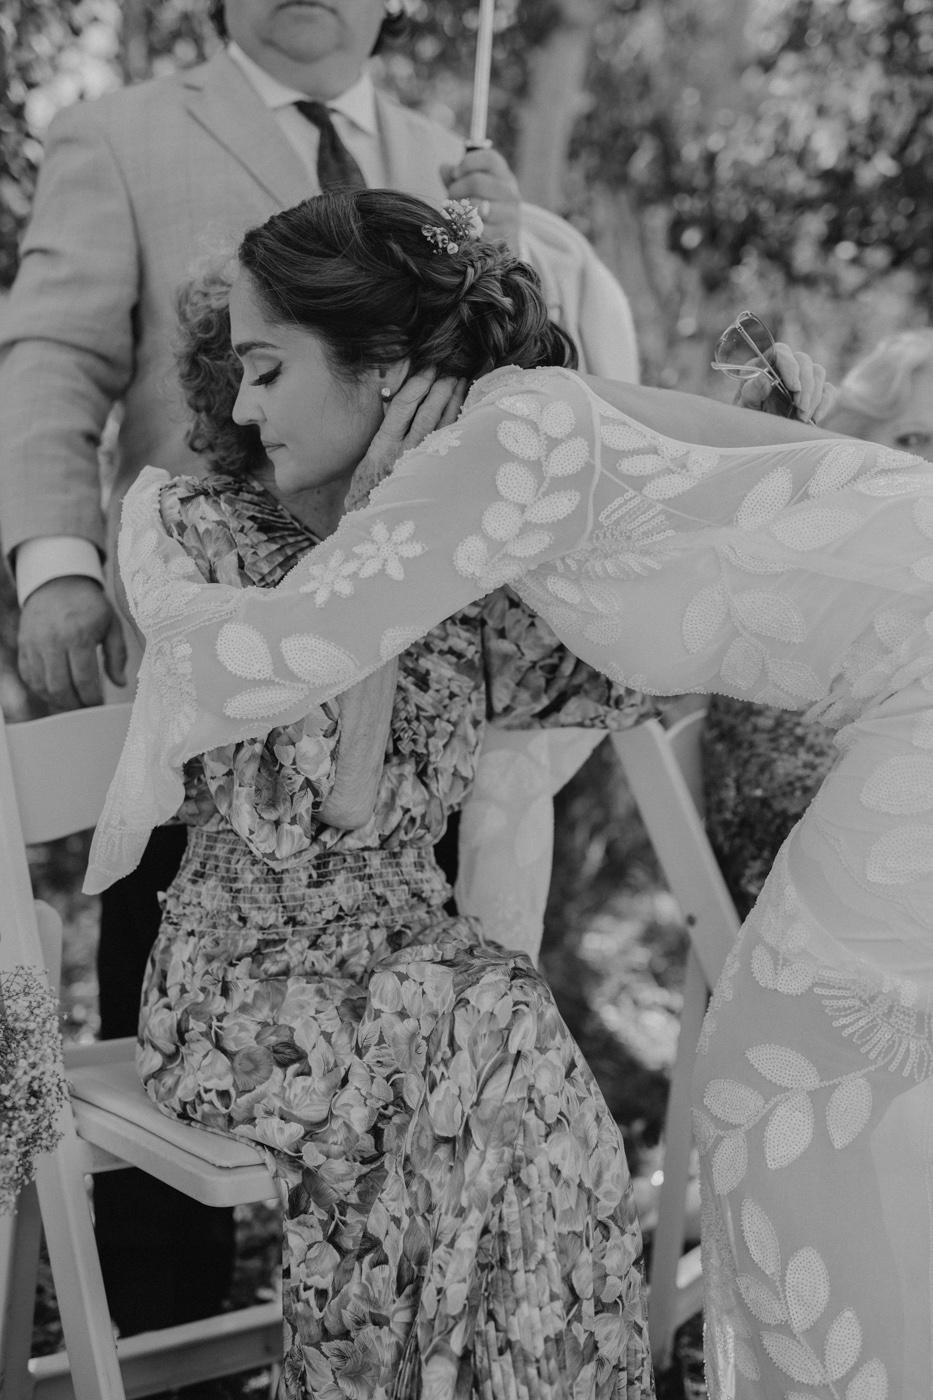 woods-walk-trail-crested-butte-colorado-wedding-66.jpg